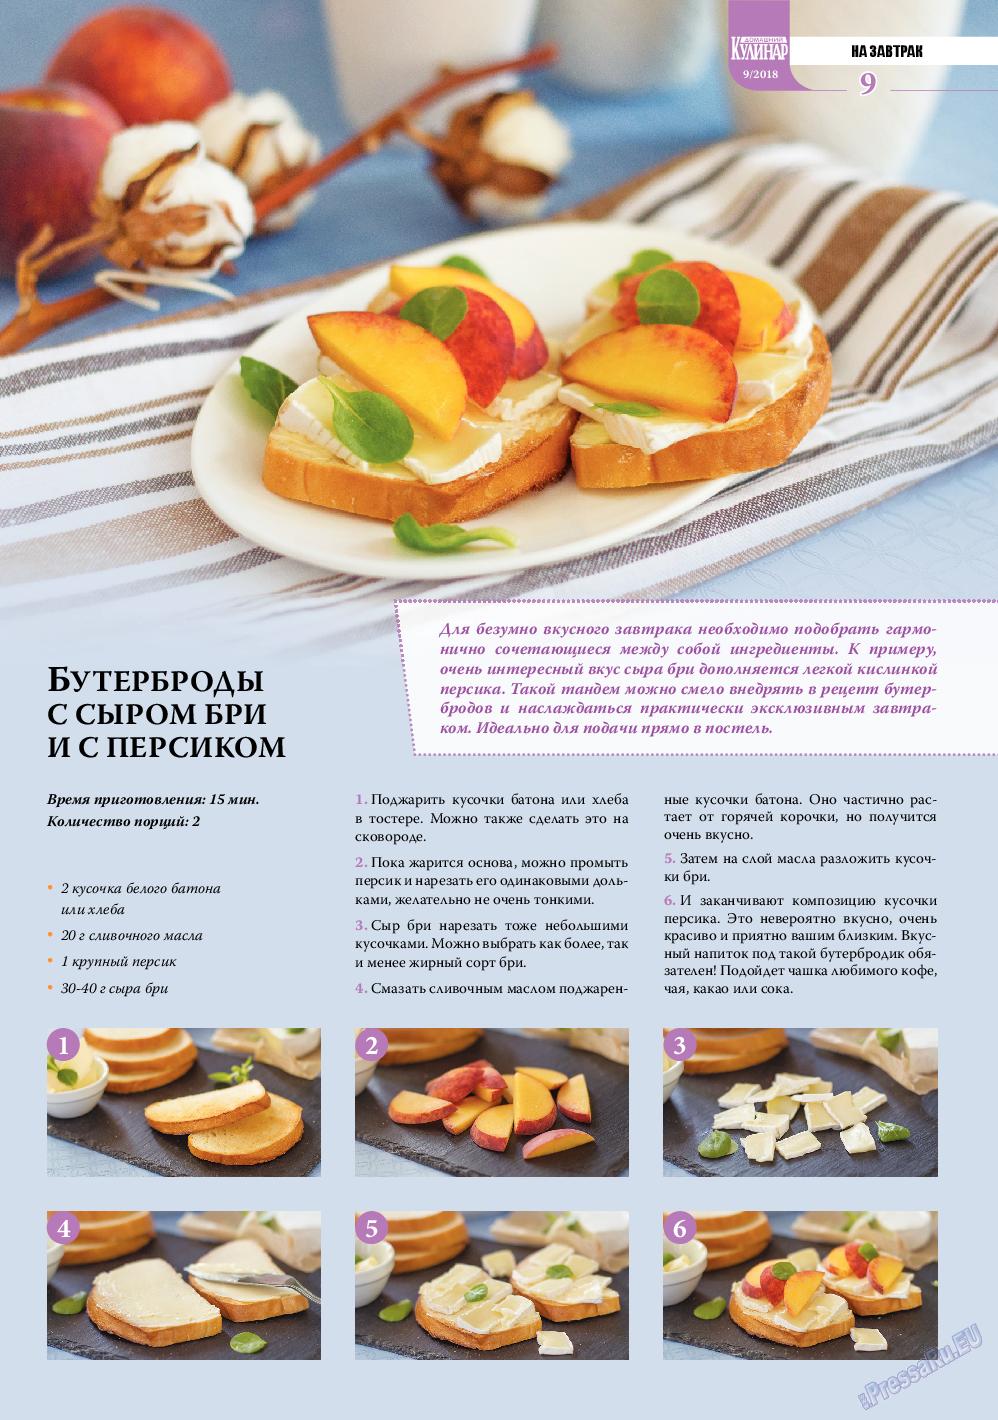 Домашний кулинар (журнал). 2018 год, номер 9, стр. 9